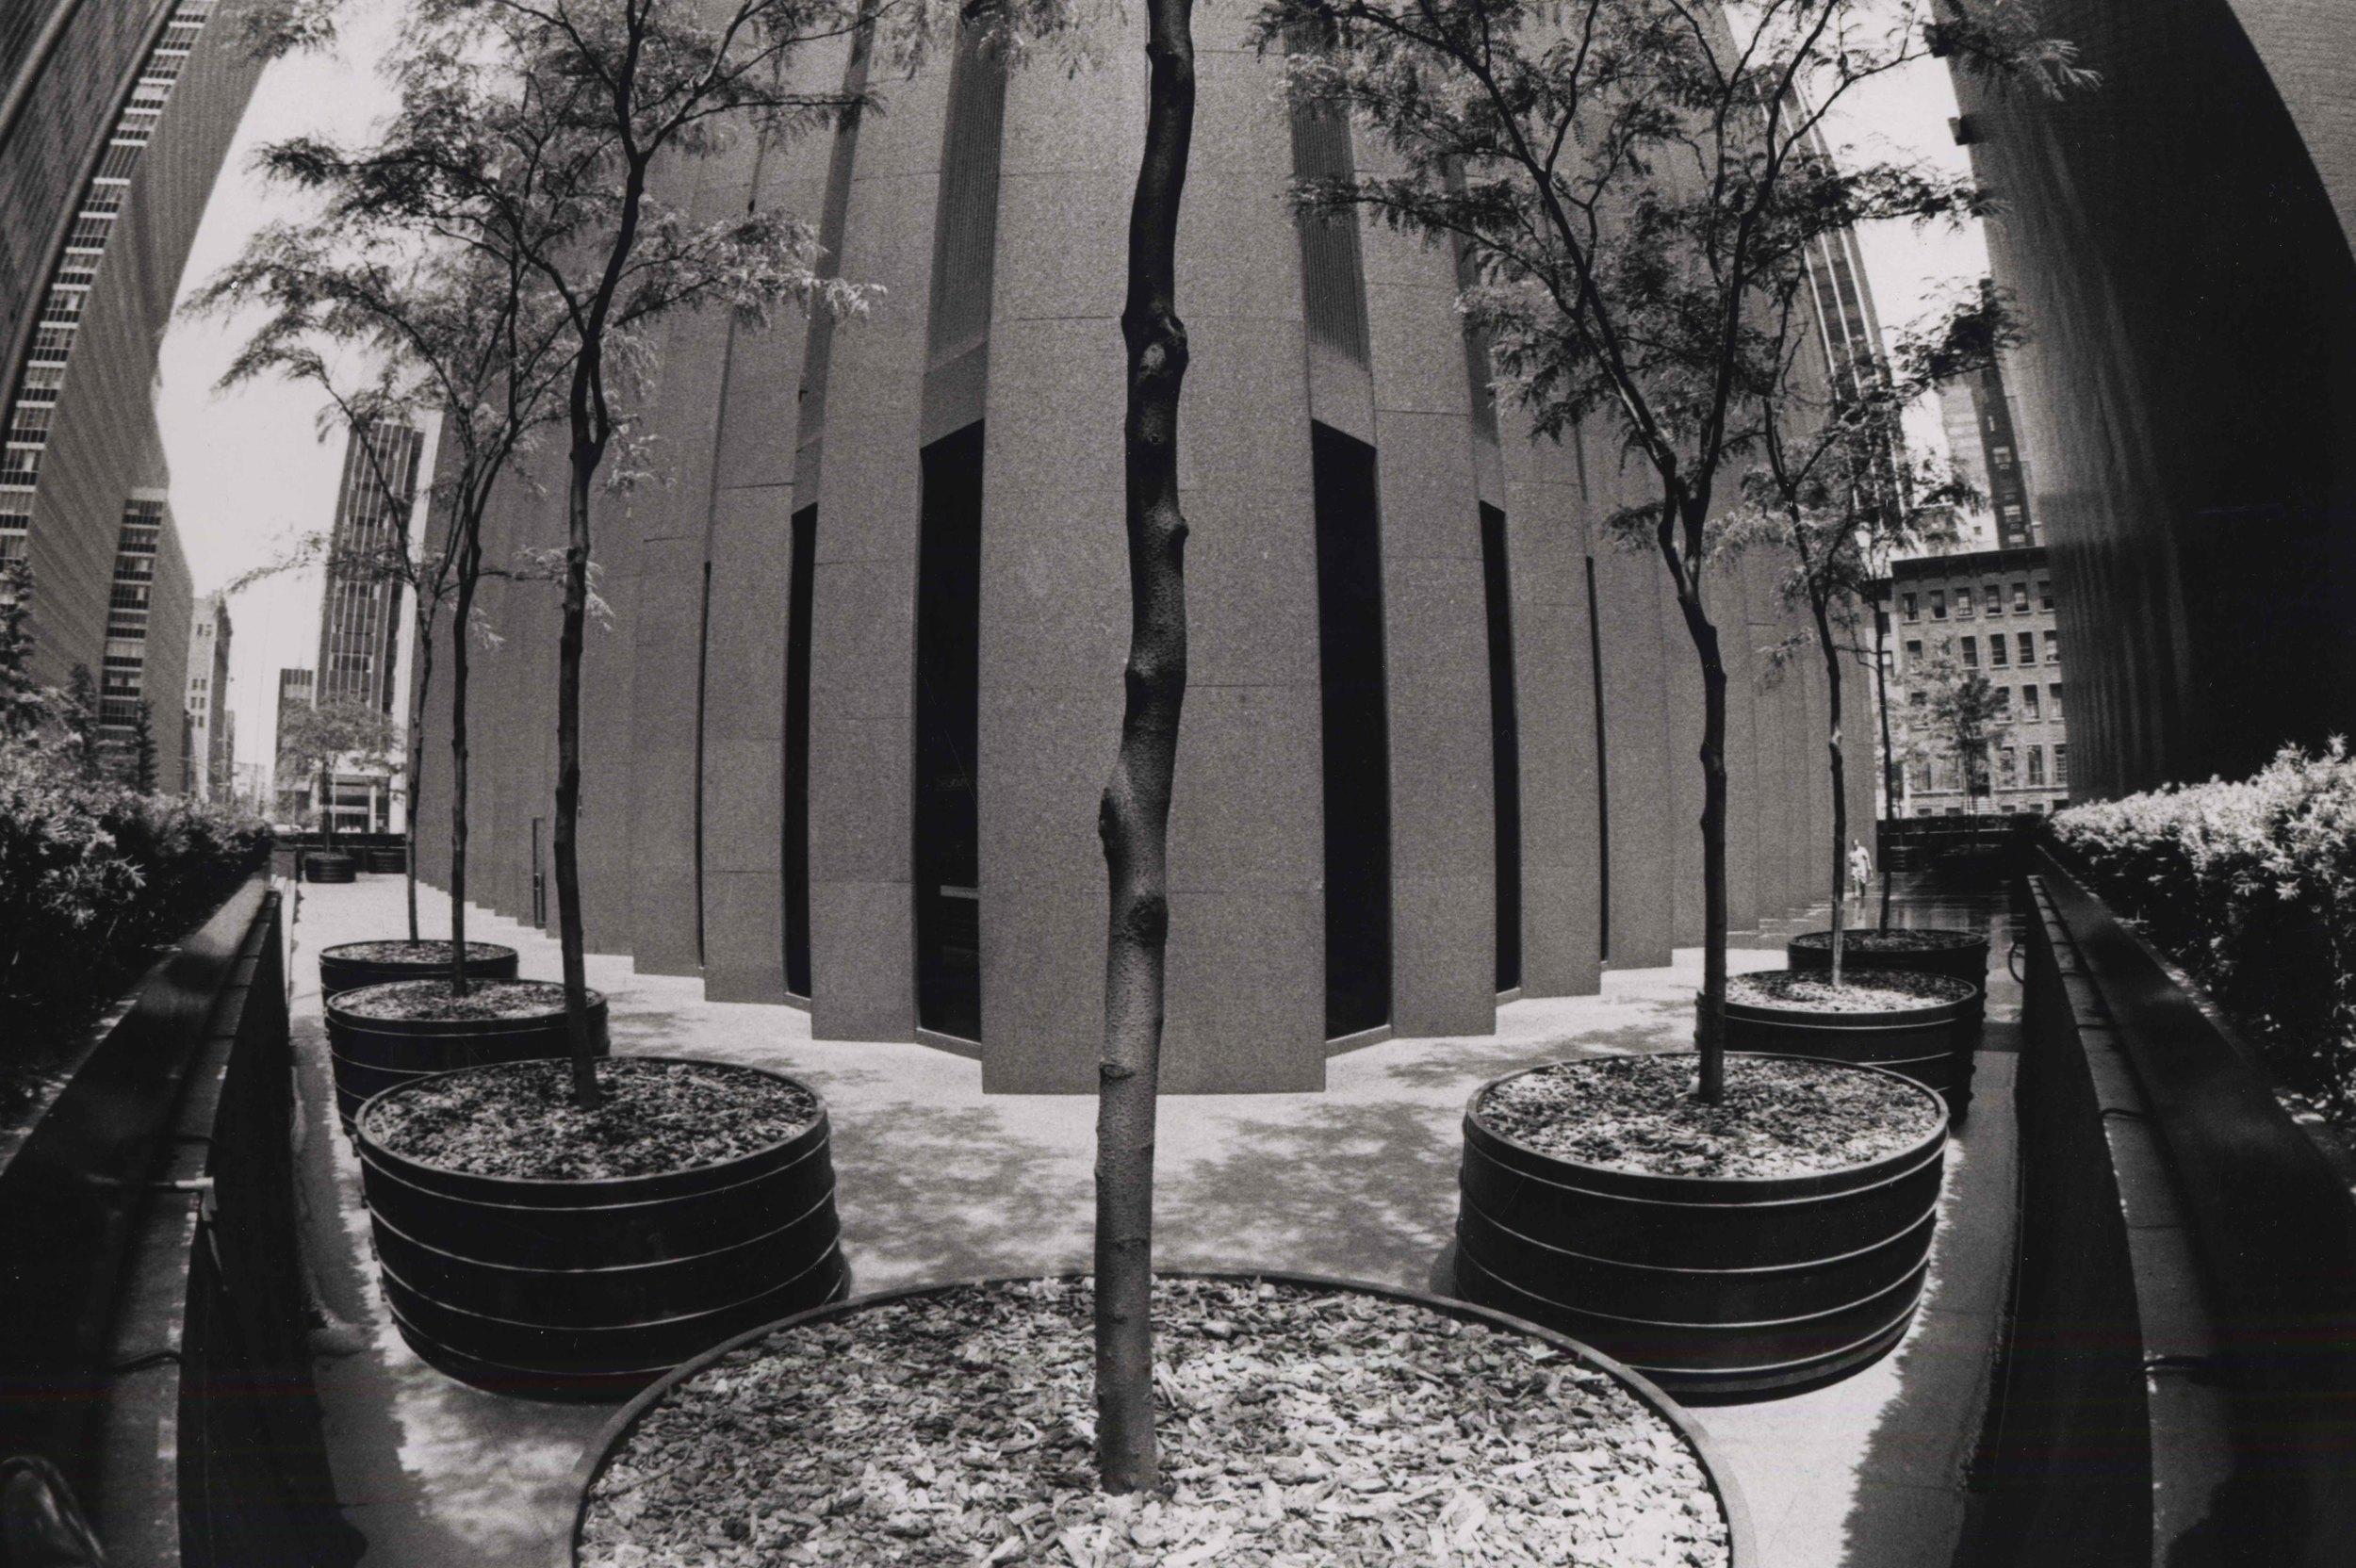 15_99_Tree planers against a building_Dan Wynn Archive.jpeg